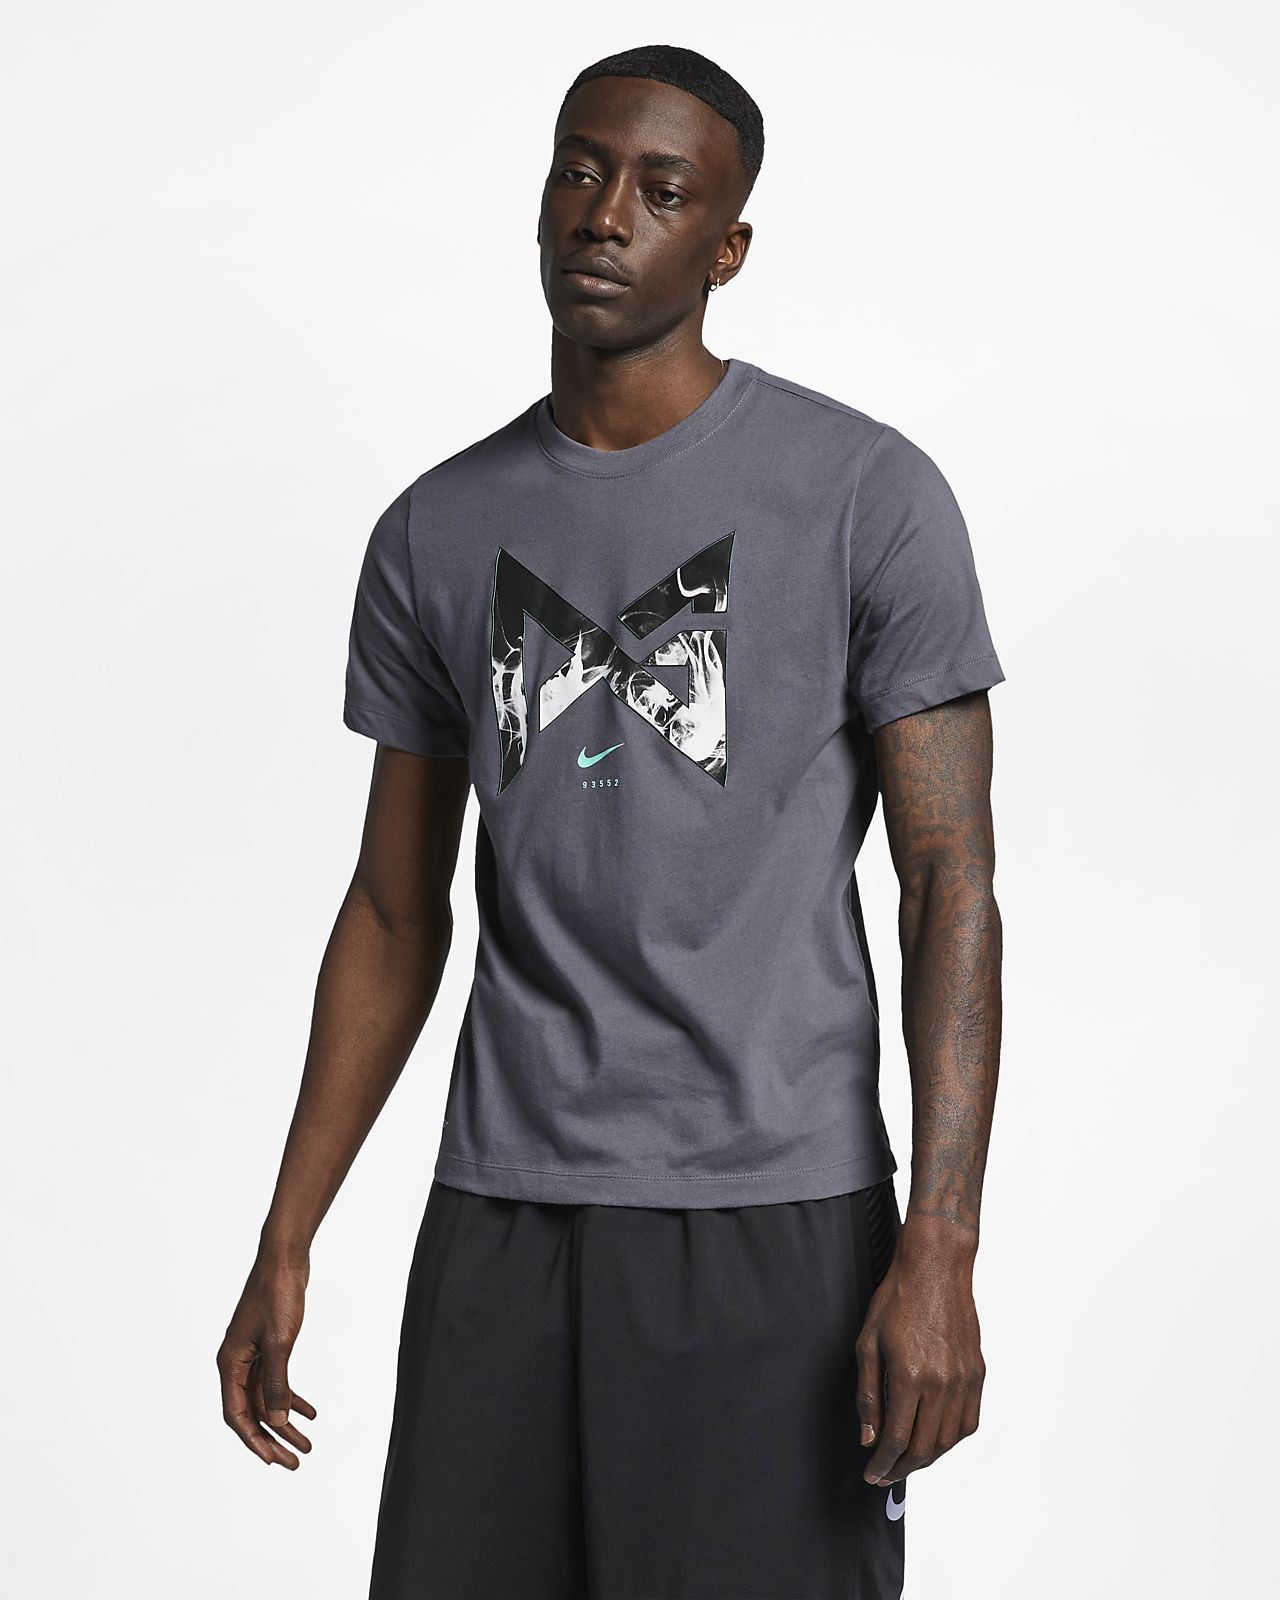 720bb08c4836a6 Nike Dri-FIT PG Men s Basketball T-Shirt. Nike.com ID